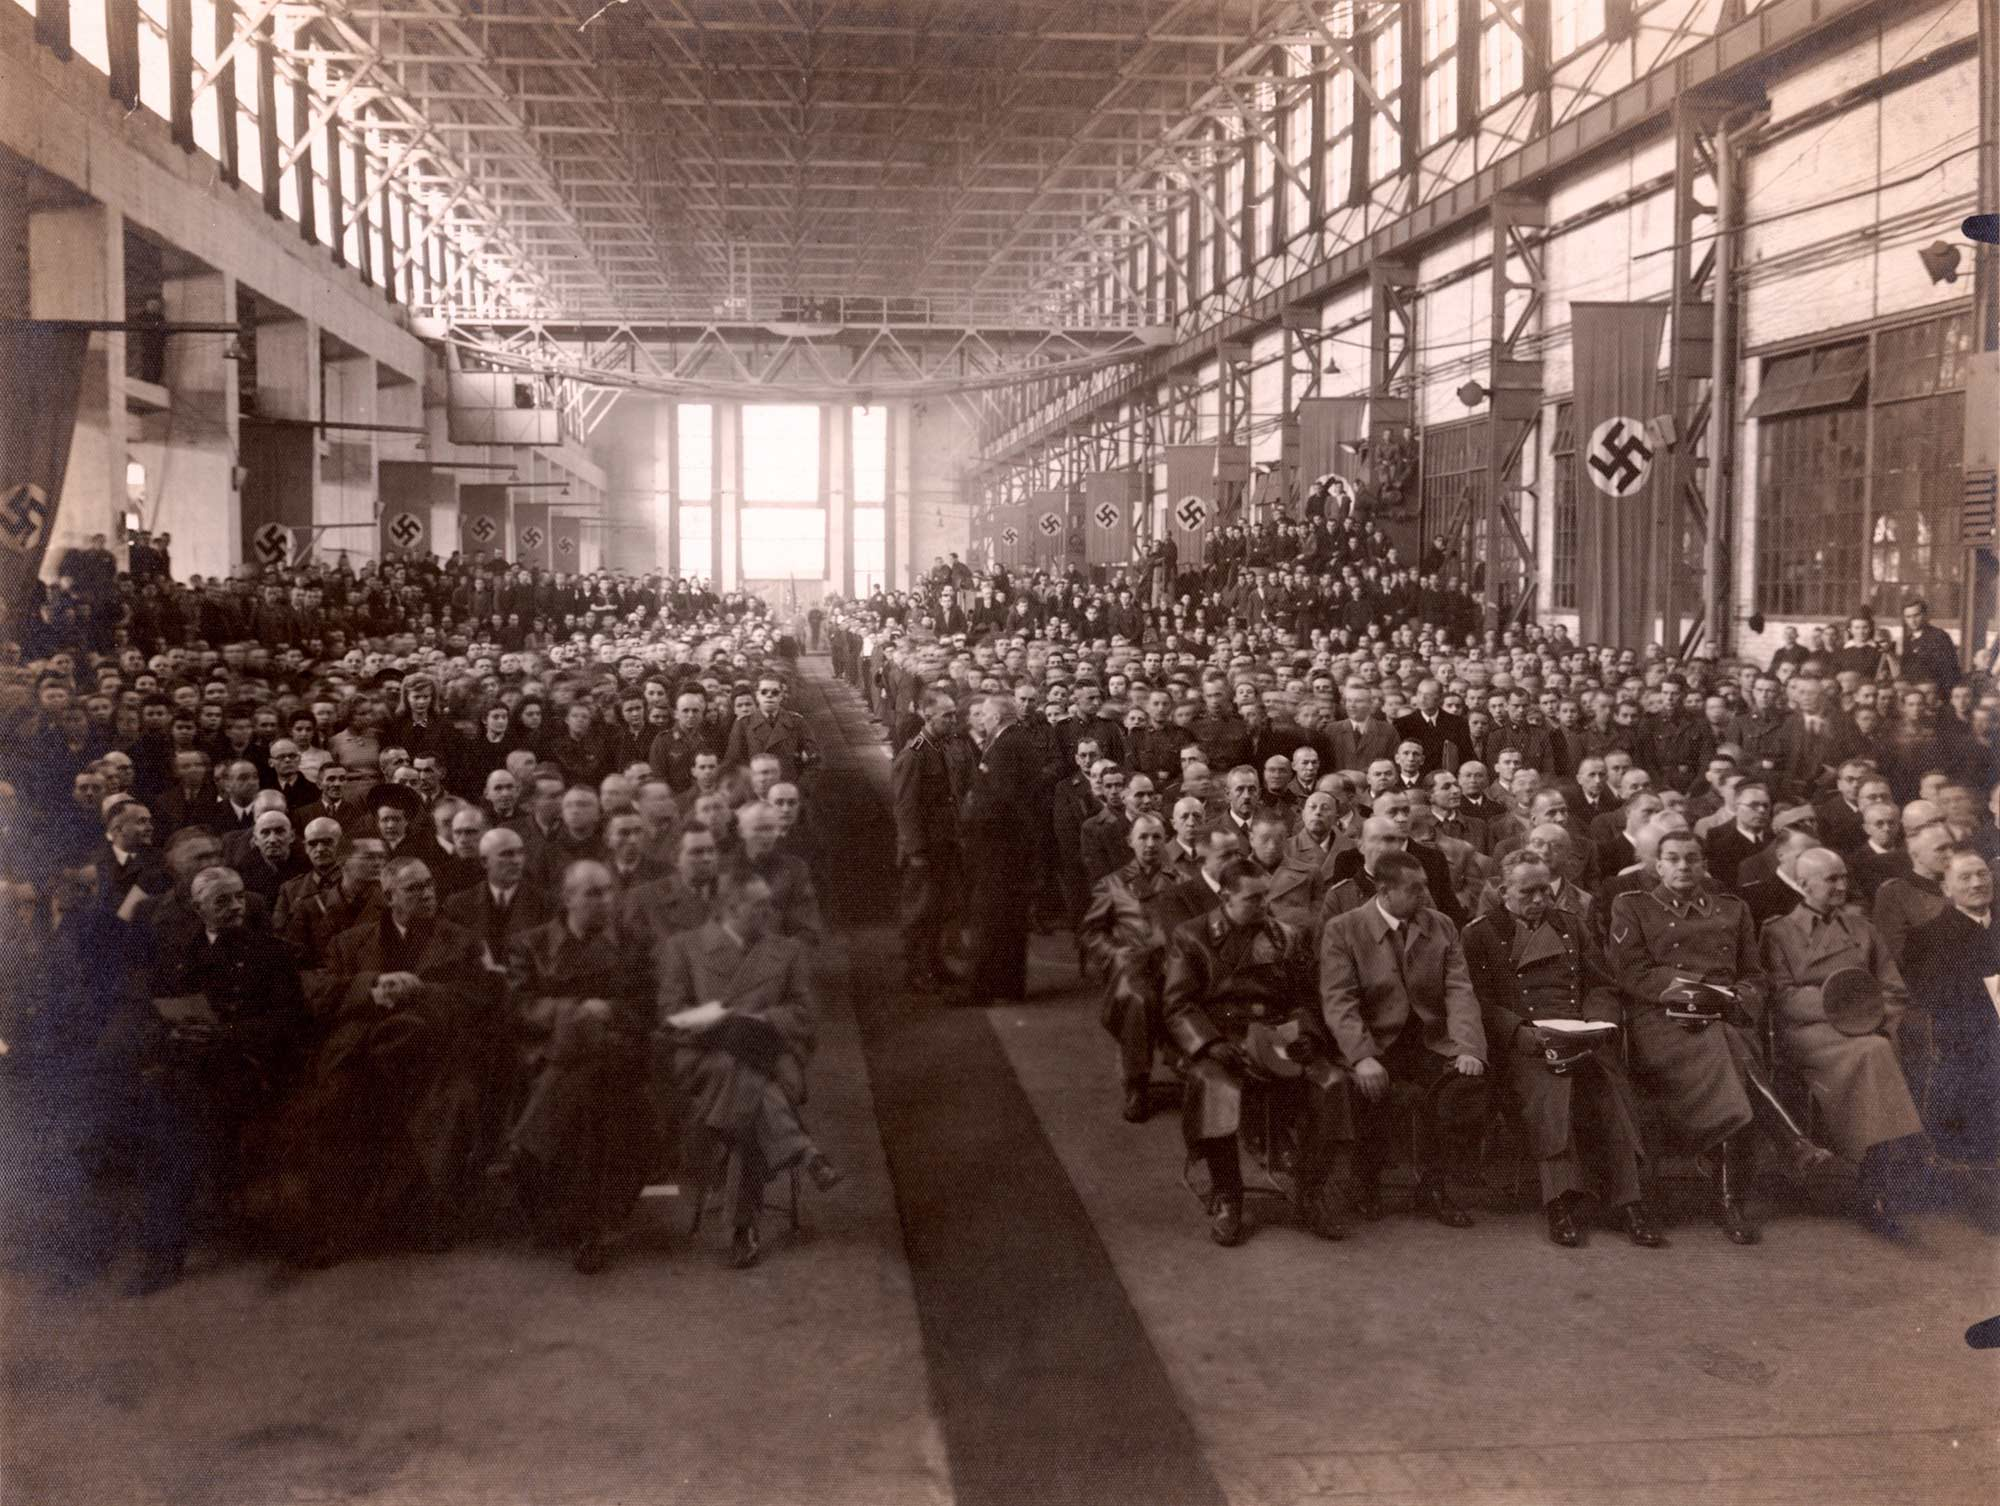 Berghütte steel plant in Silesia celebratory day. 1940-1945. Archivum Panstwowe w Katowicach Land